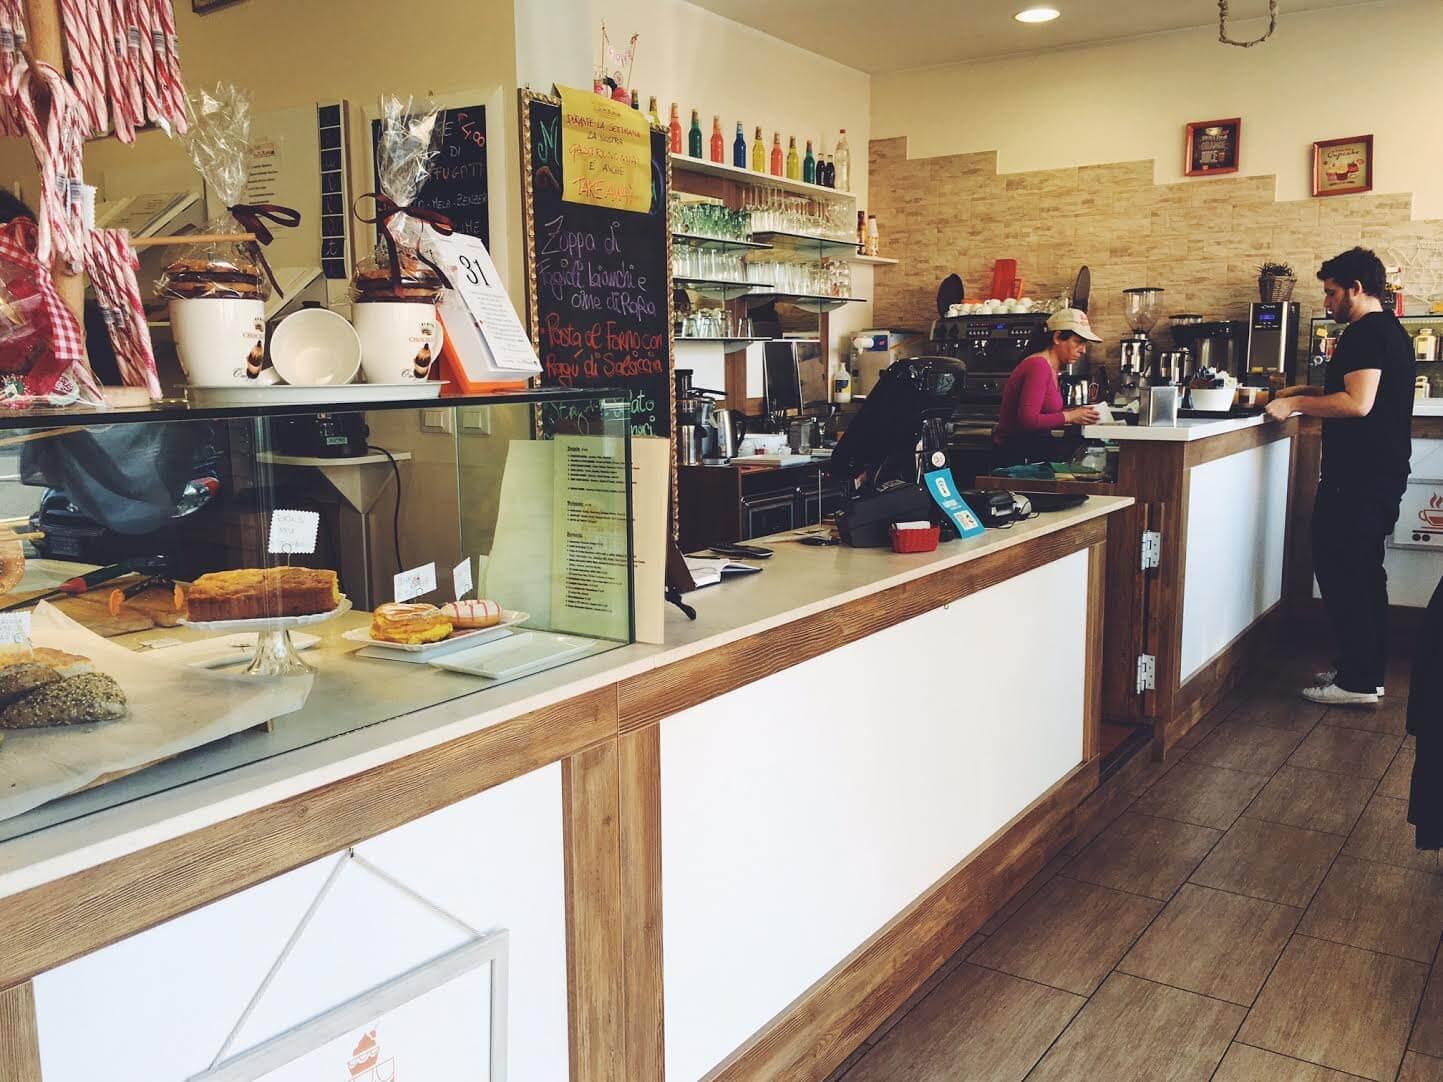 Domenica a bologna brunch da bakery station my lovely for Hotel casalecchio bologna